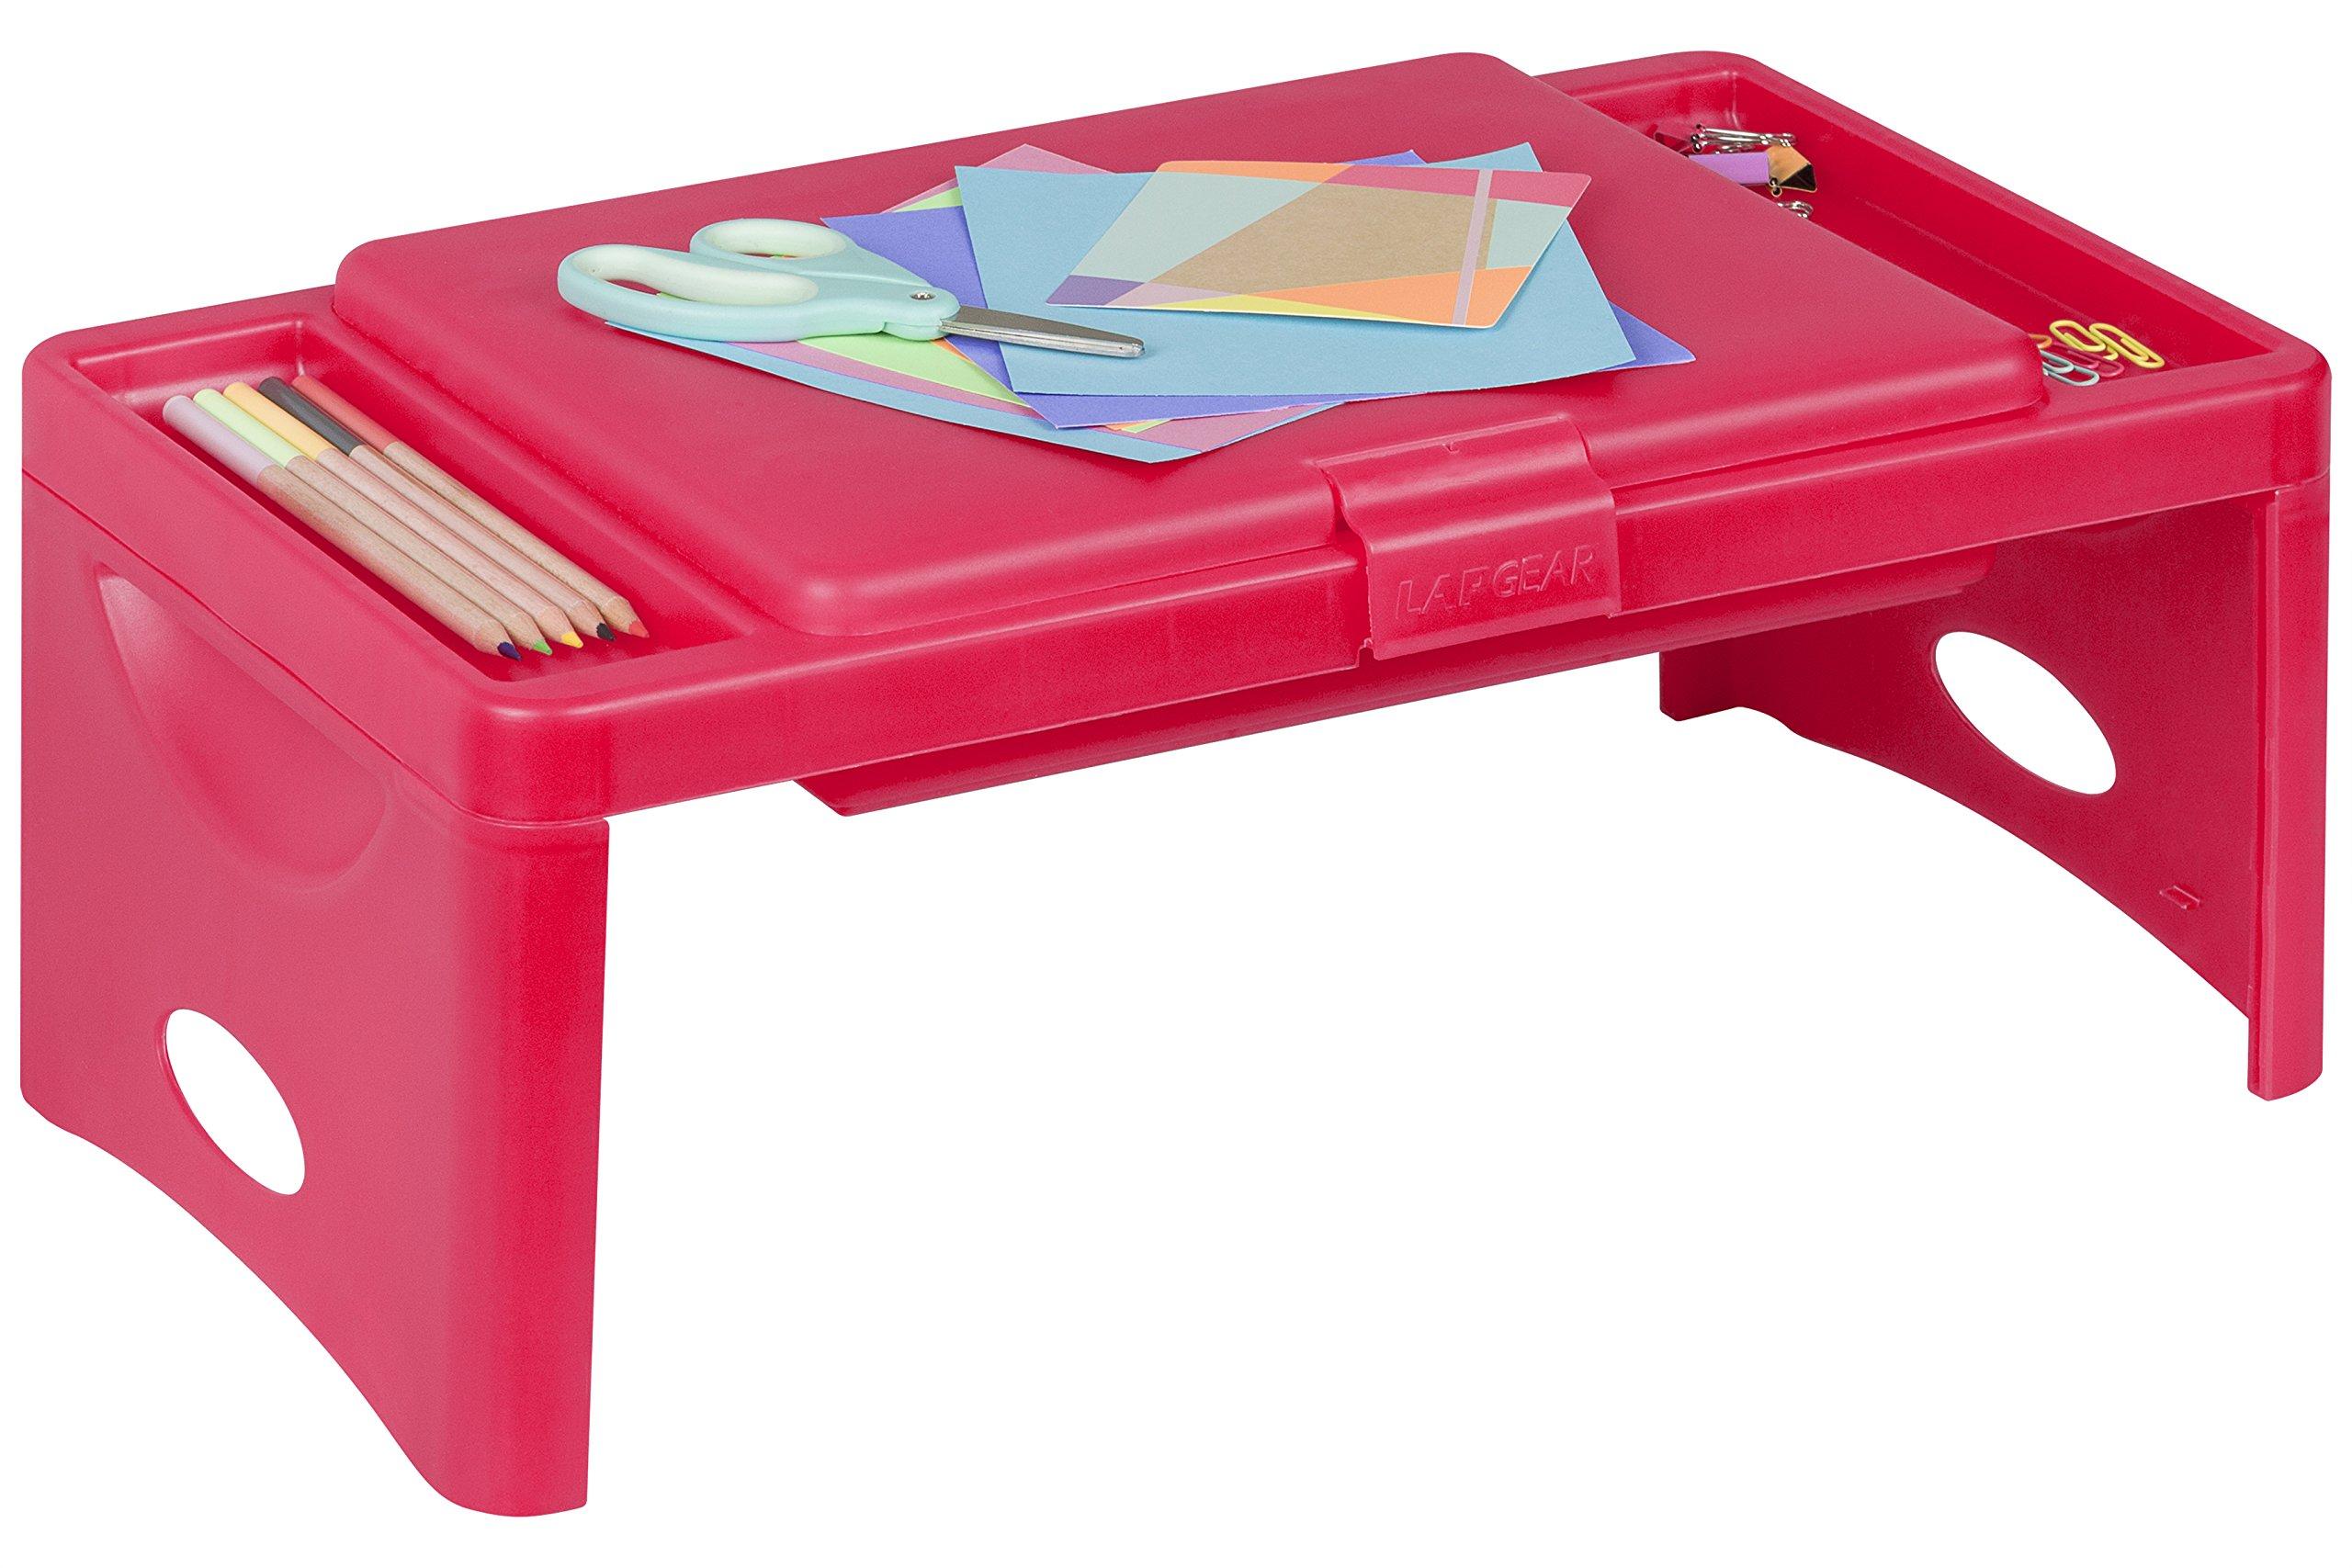 LapGear Activity Lap Desk - Fuchsia